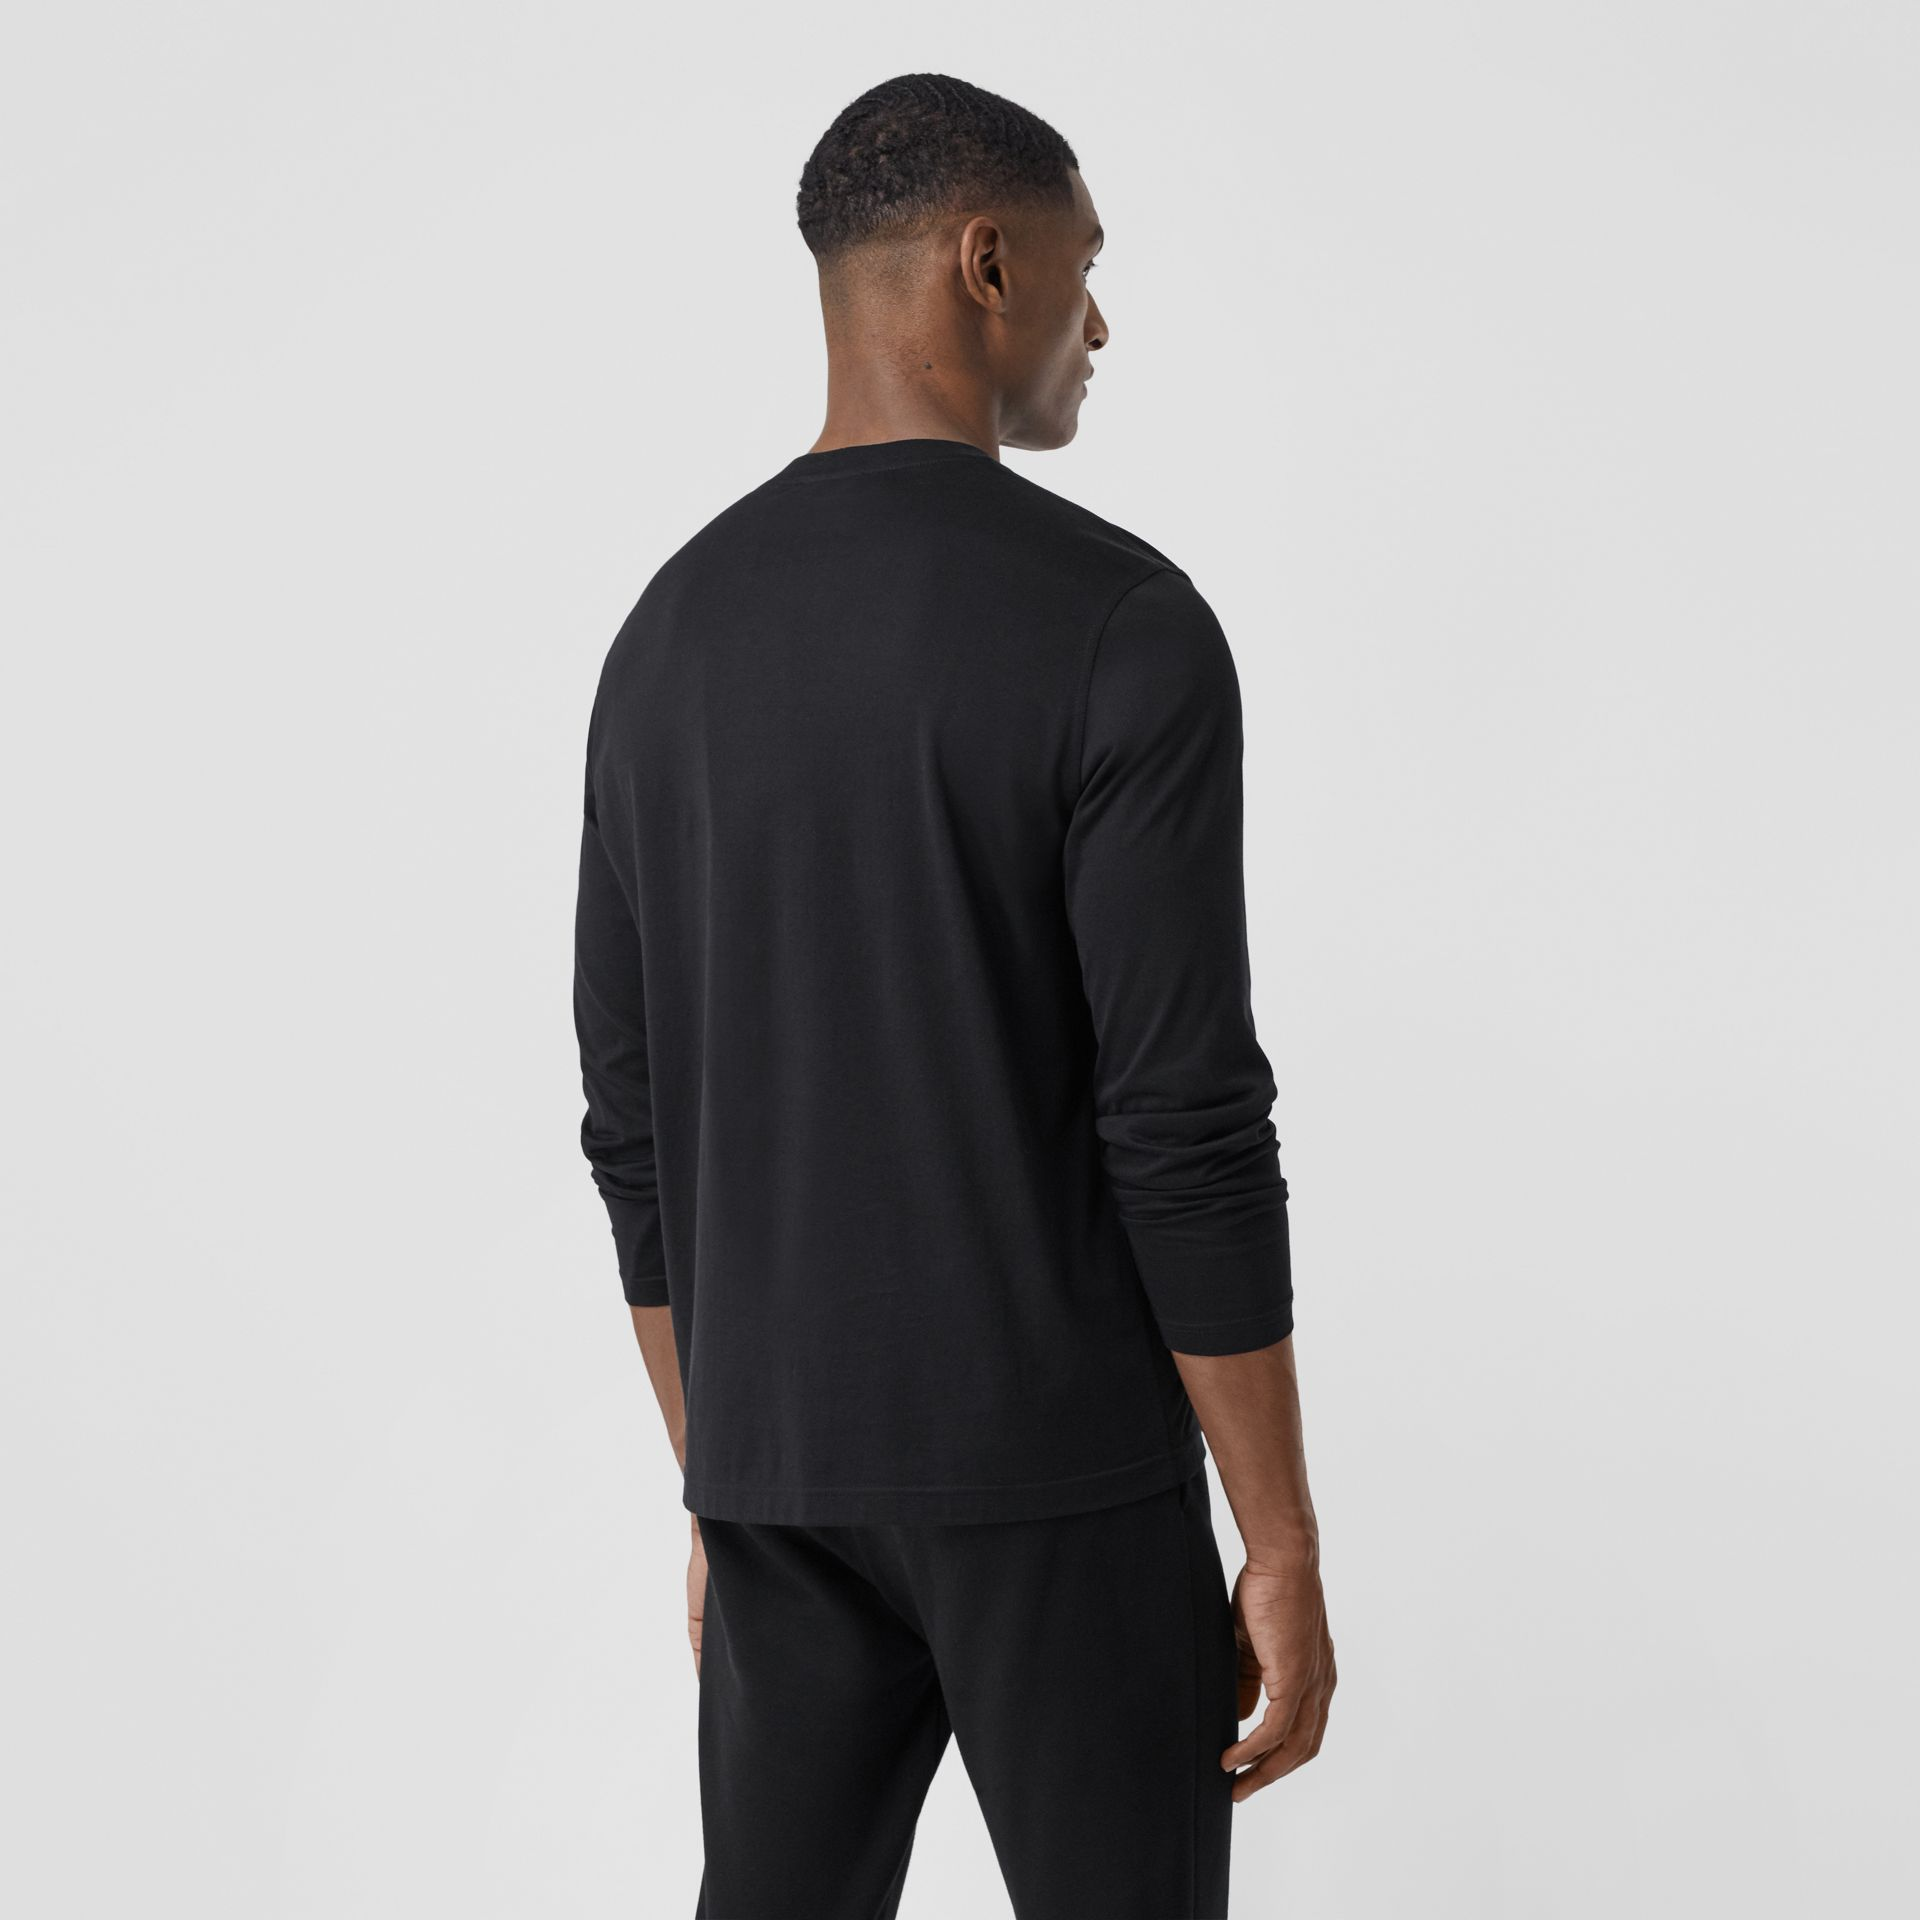 Long-sleeve Monogram Motif Cotton Top in Black - Men | Burberry - gallery image 2